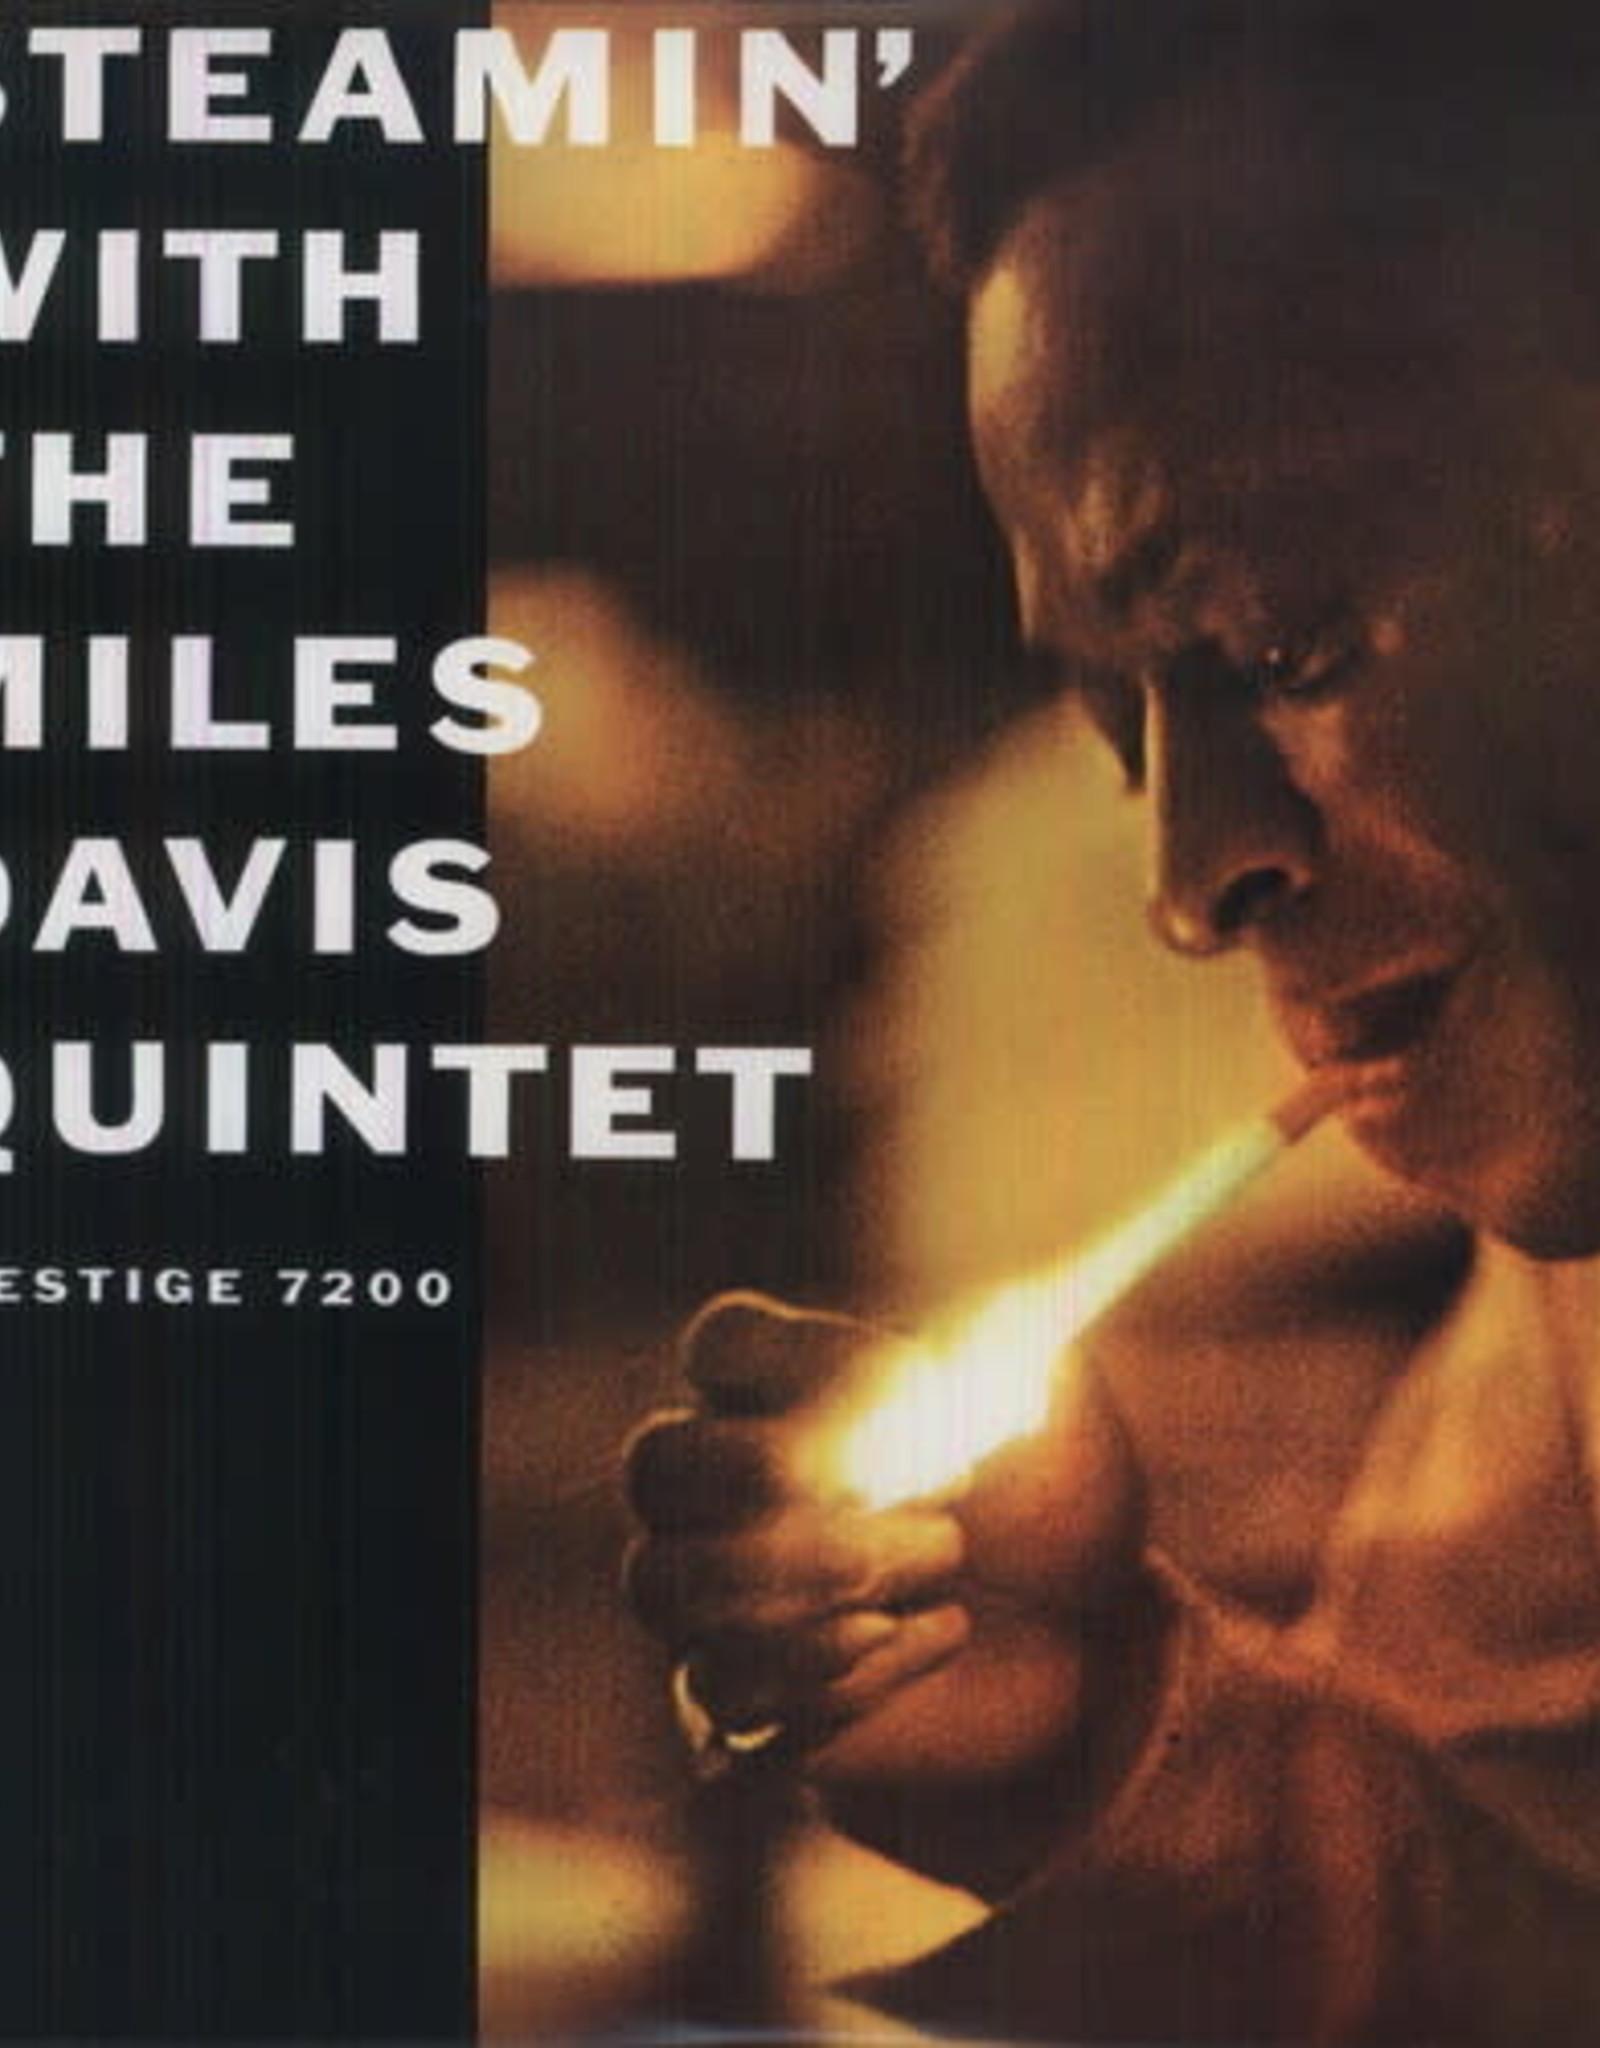 Miles Davis - Steamin' With The Miles Davis Quintet